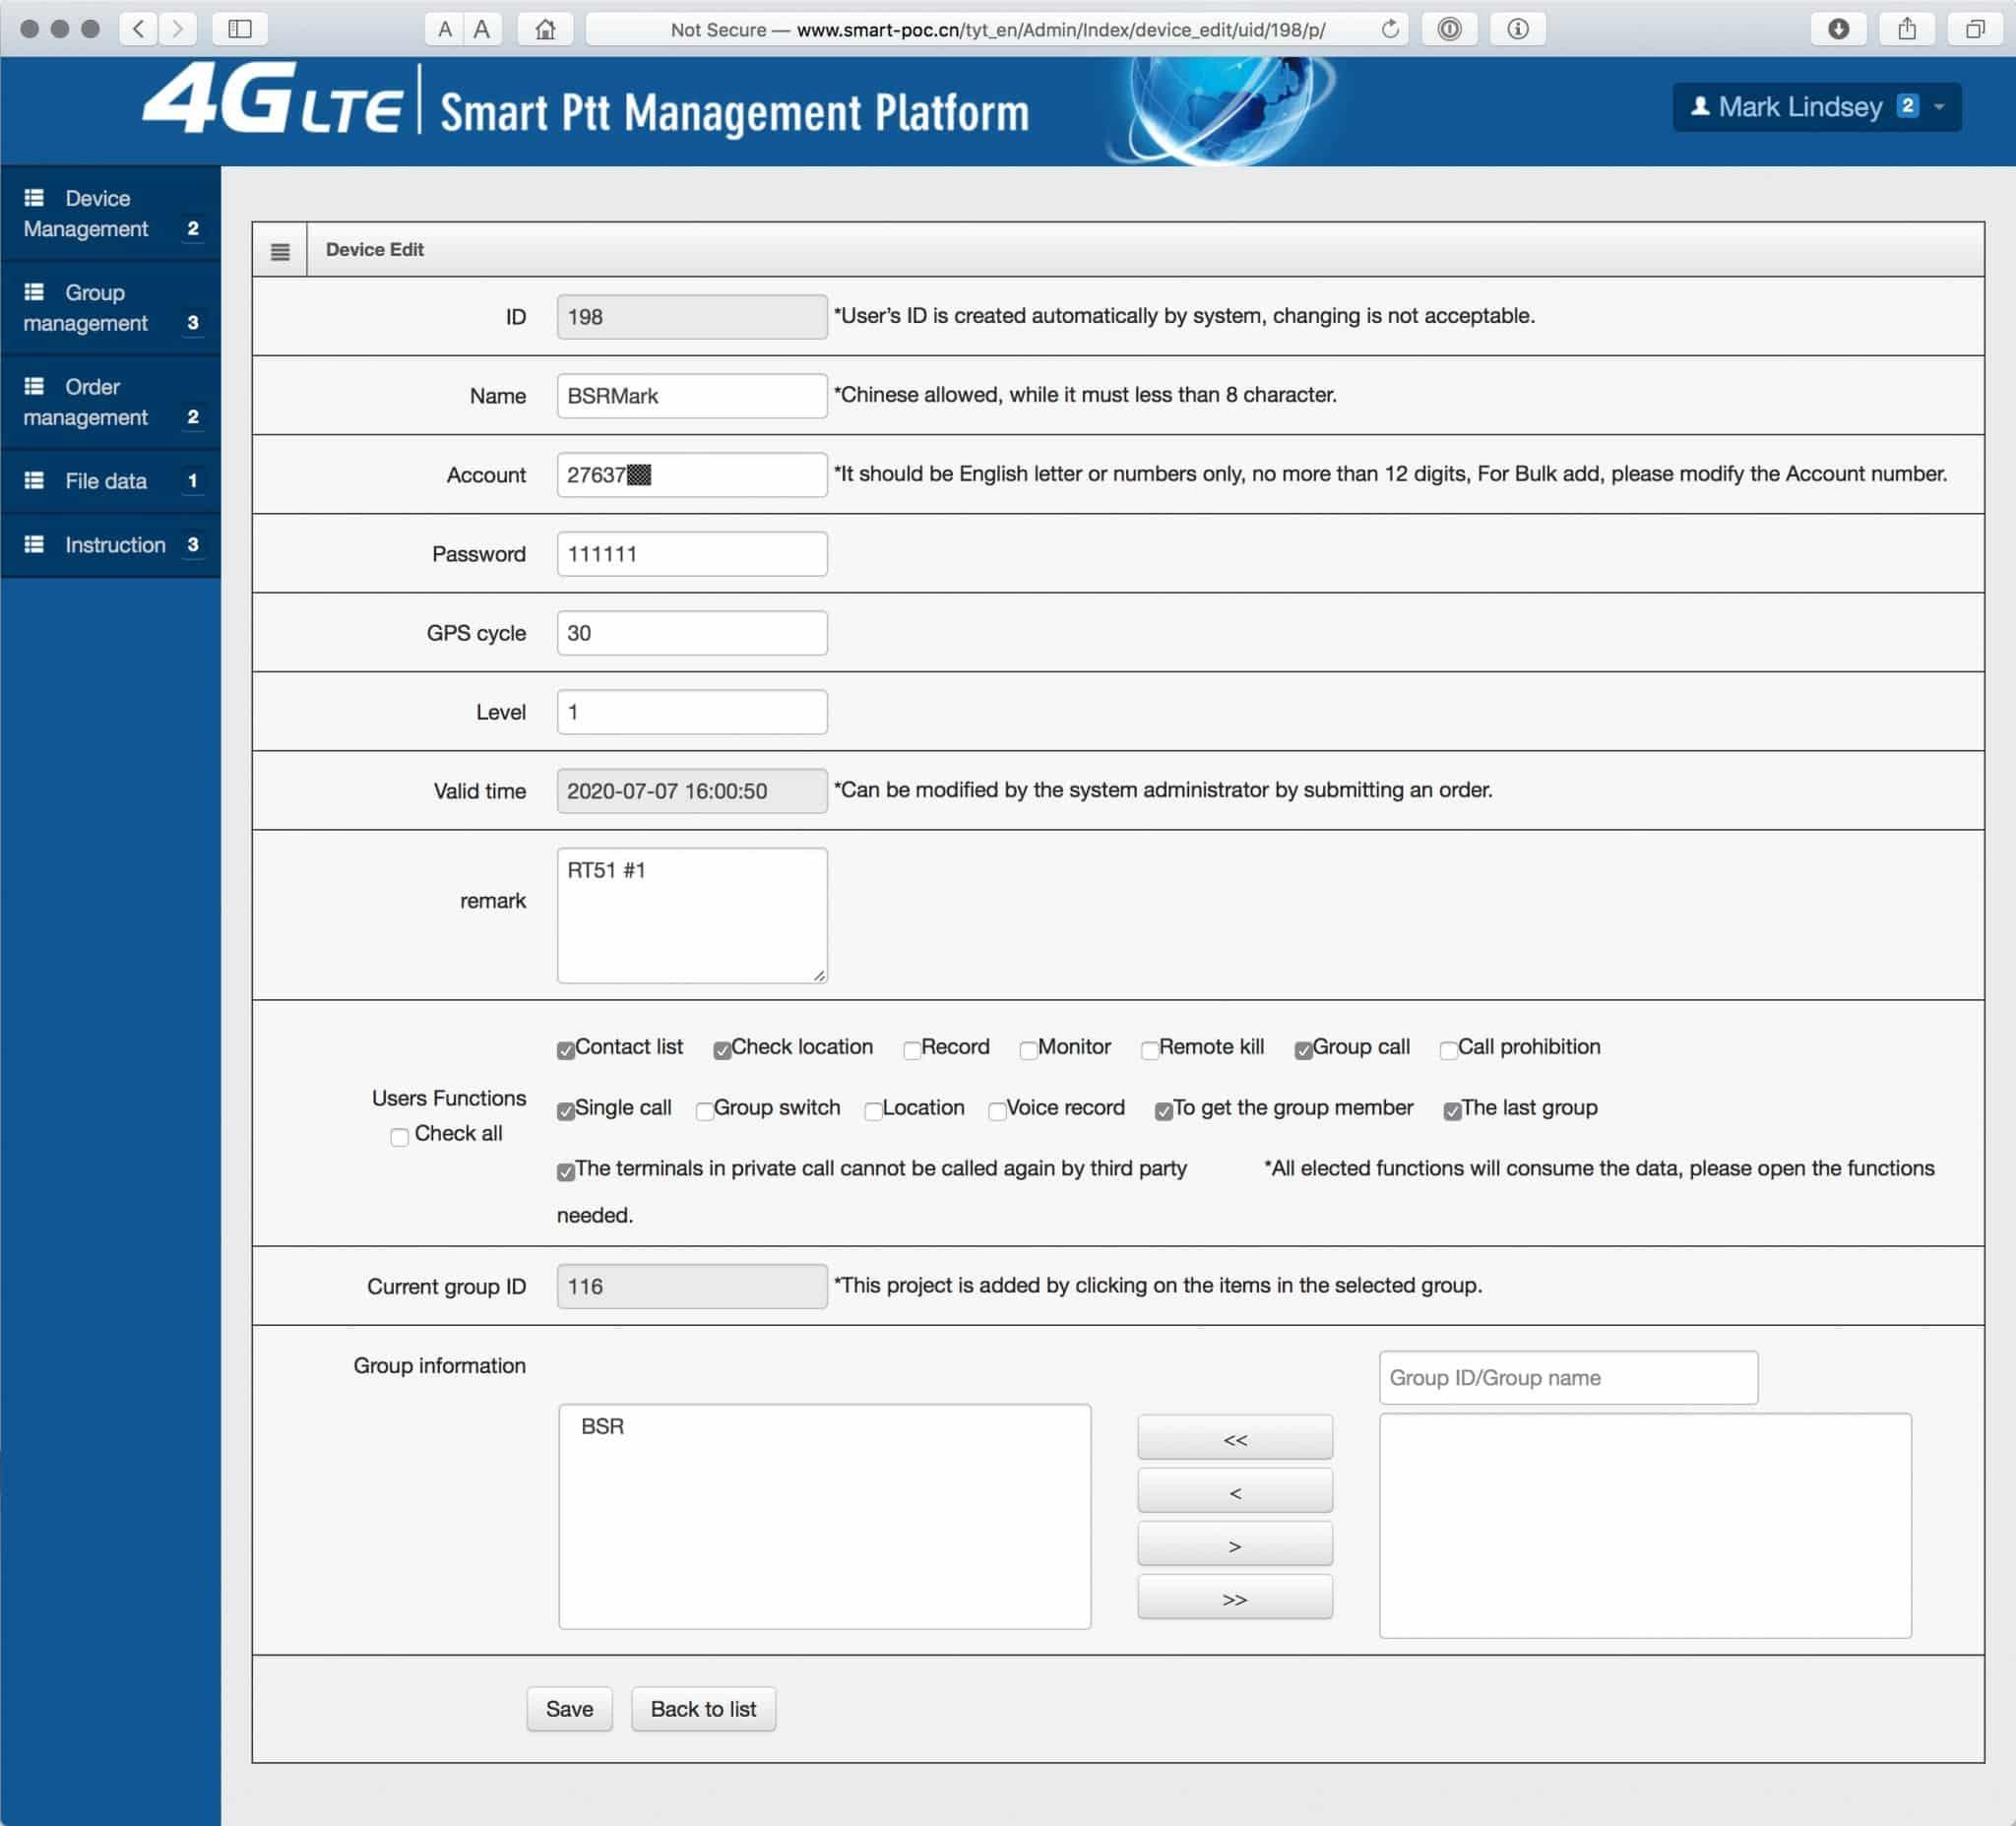 A screenshot of the Smart Ptt Management Platform's Modify Device page